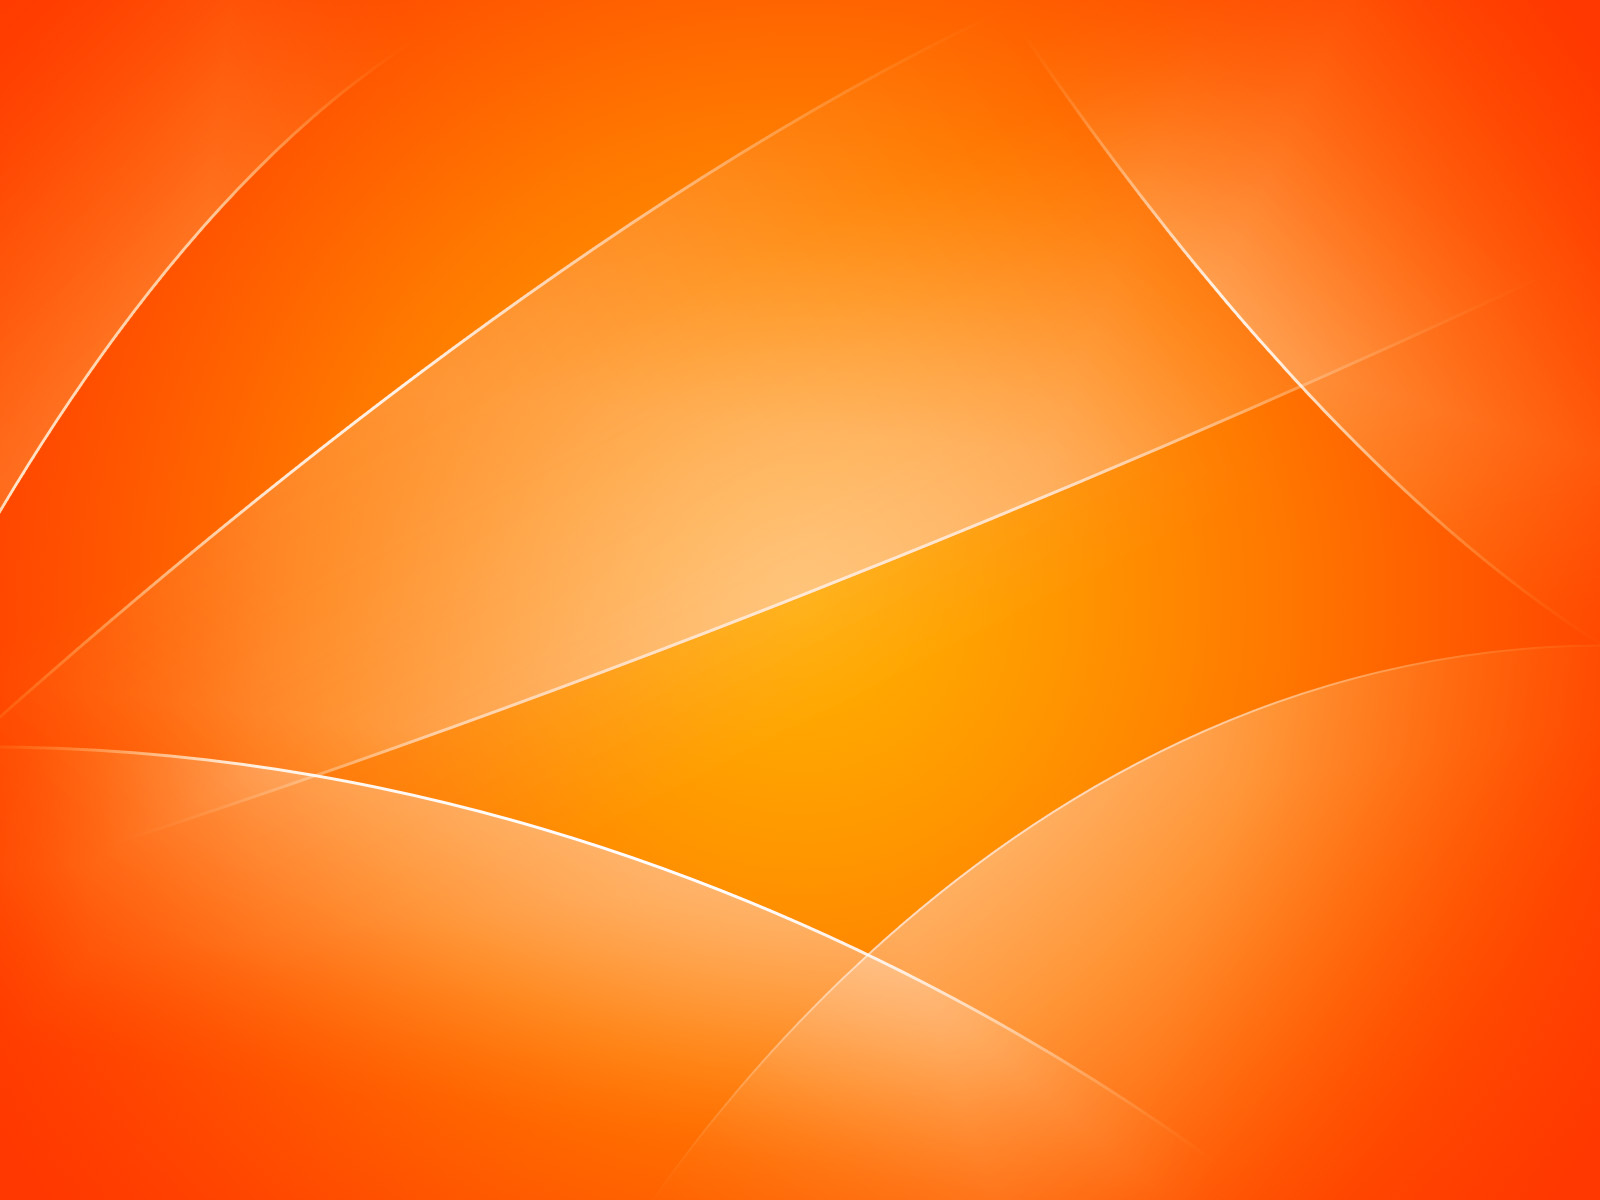 Orange 3D wallpapers Orange 3D background   Page 8 1600x1200